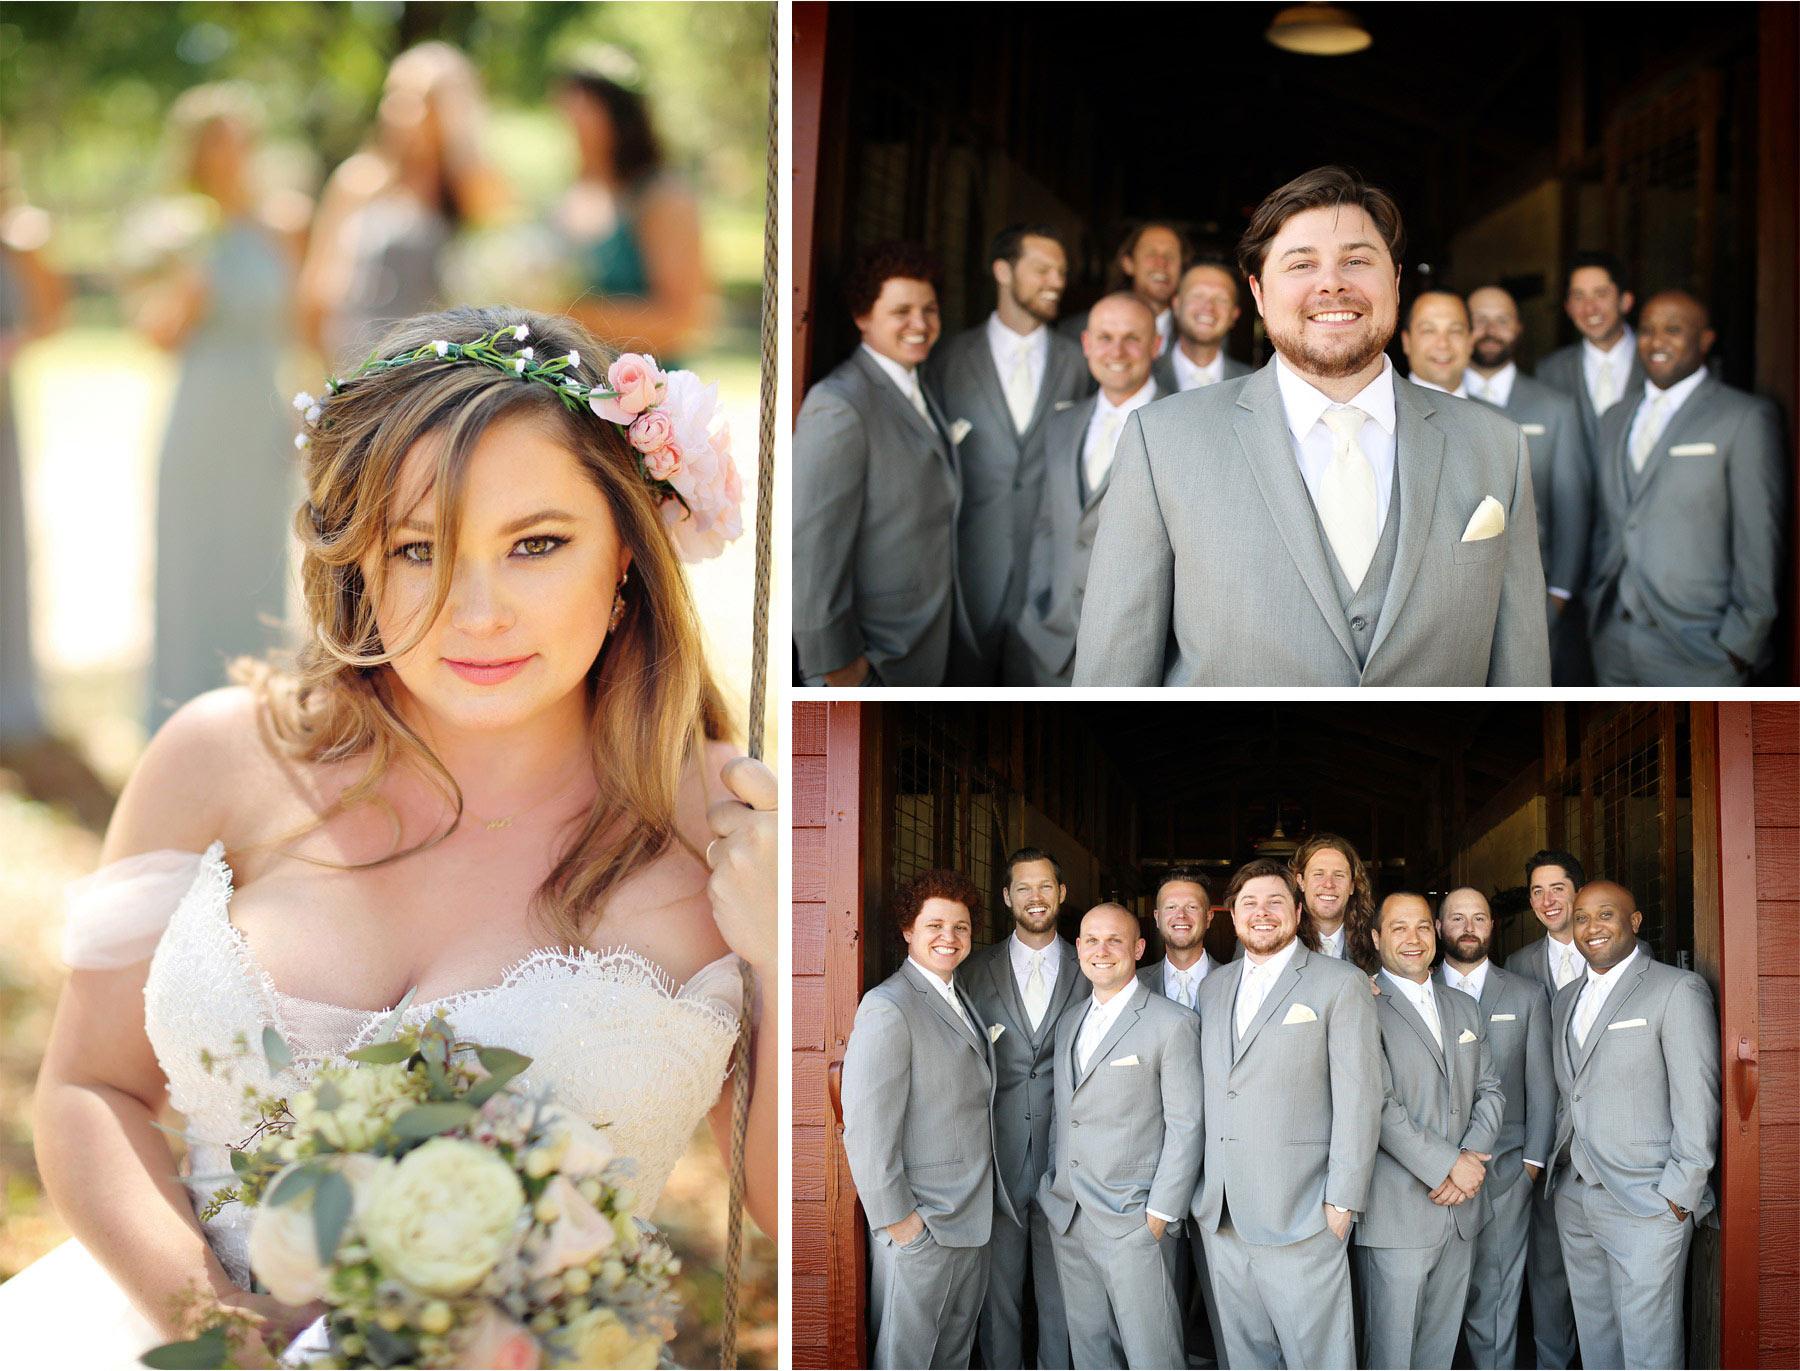 11-Brandon-Florida-Wedding-Photographer-by-Andrew-Vick-Photography-Casa-Lantana-Spring-Bride-Groom-Bridesmaids-Groomsmen-Flower-Crown-Barn-Kristianna-and-Ben.jpg